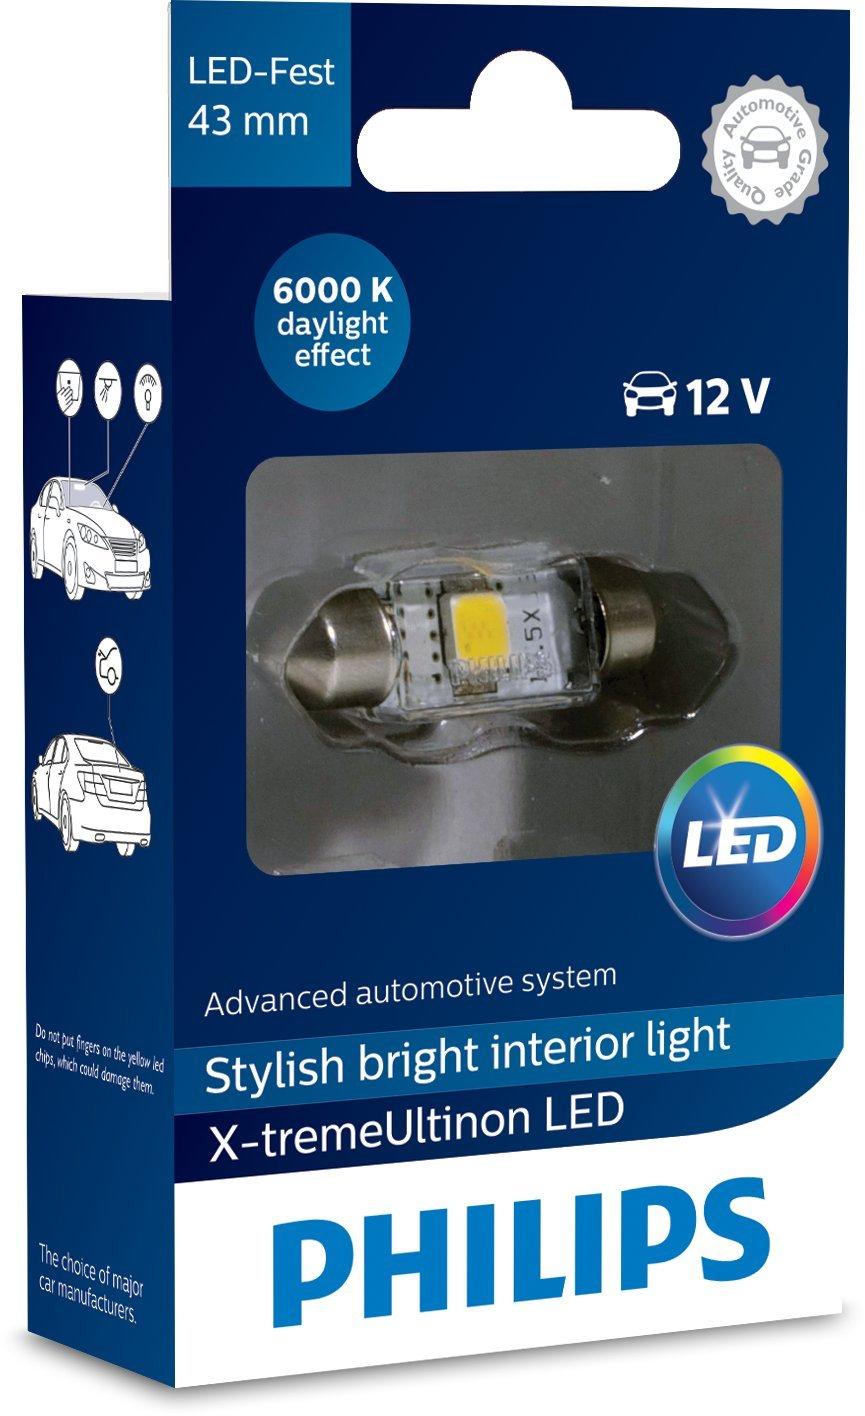 Philips 12946I60X1 X-tremeUltinon LED Luce per abitacolo C5W 43mm Festoon 6000K 12V, 1 Pezzo, Xenon White, 43 mm Lumileds Germany GmbH